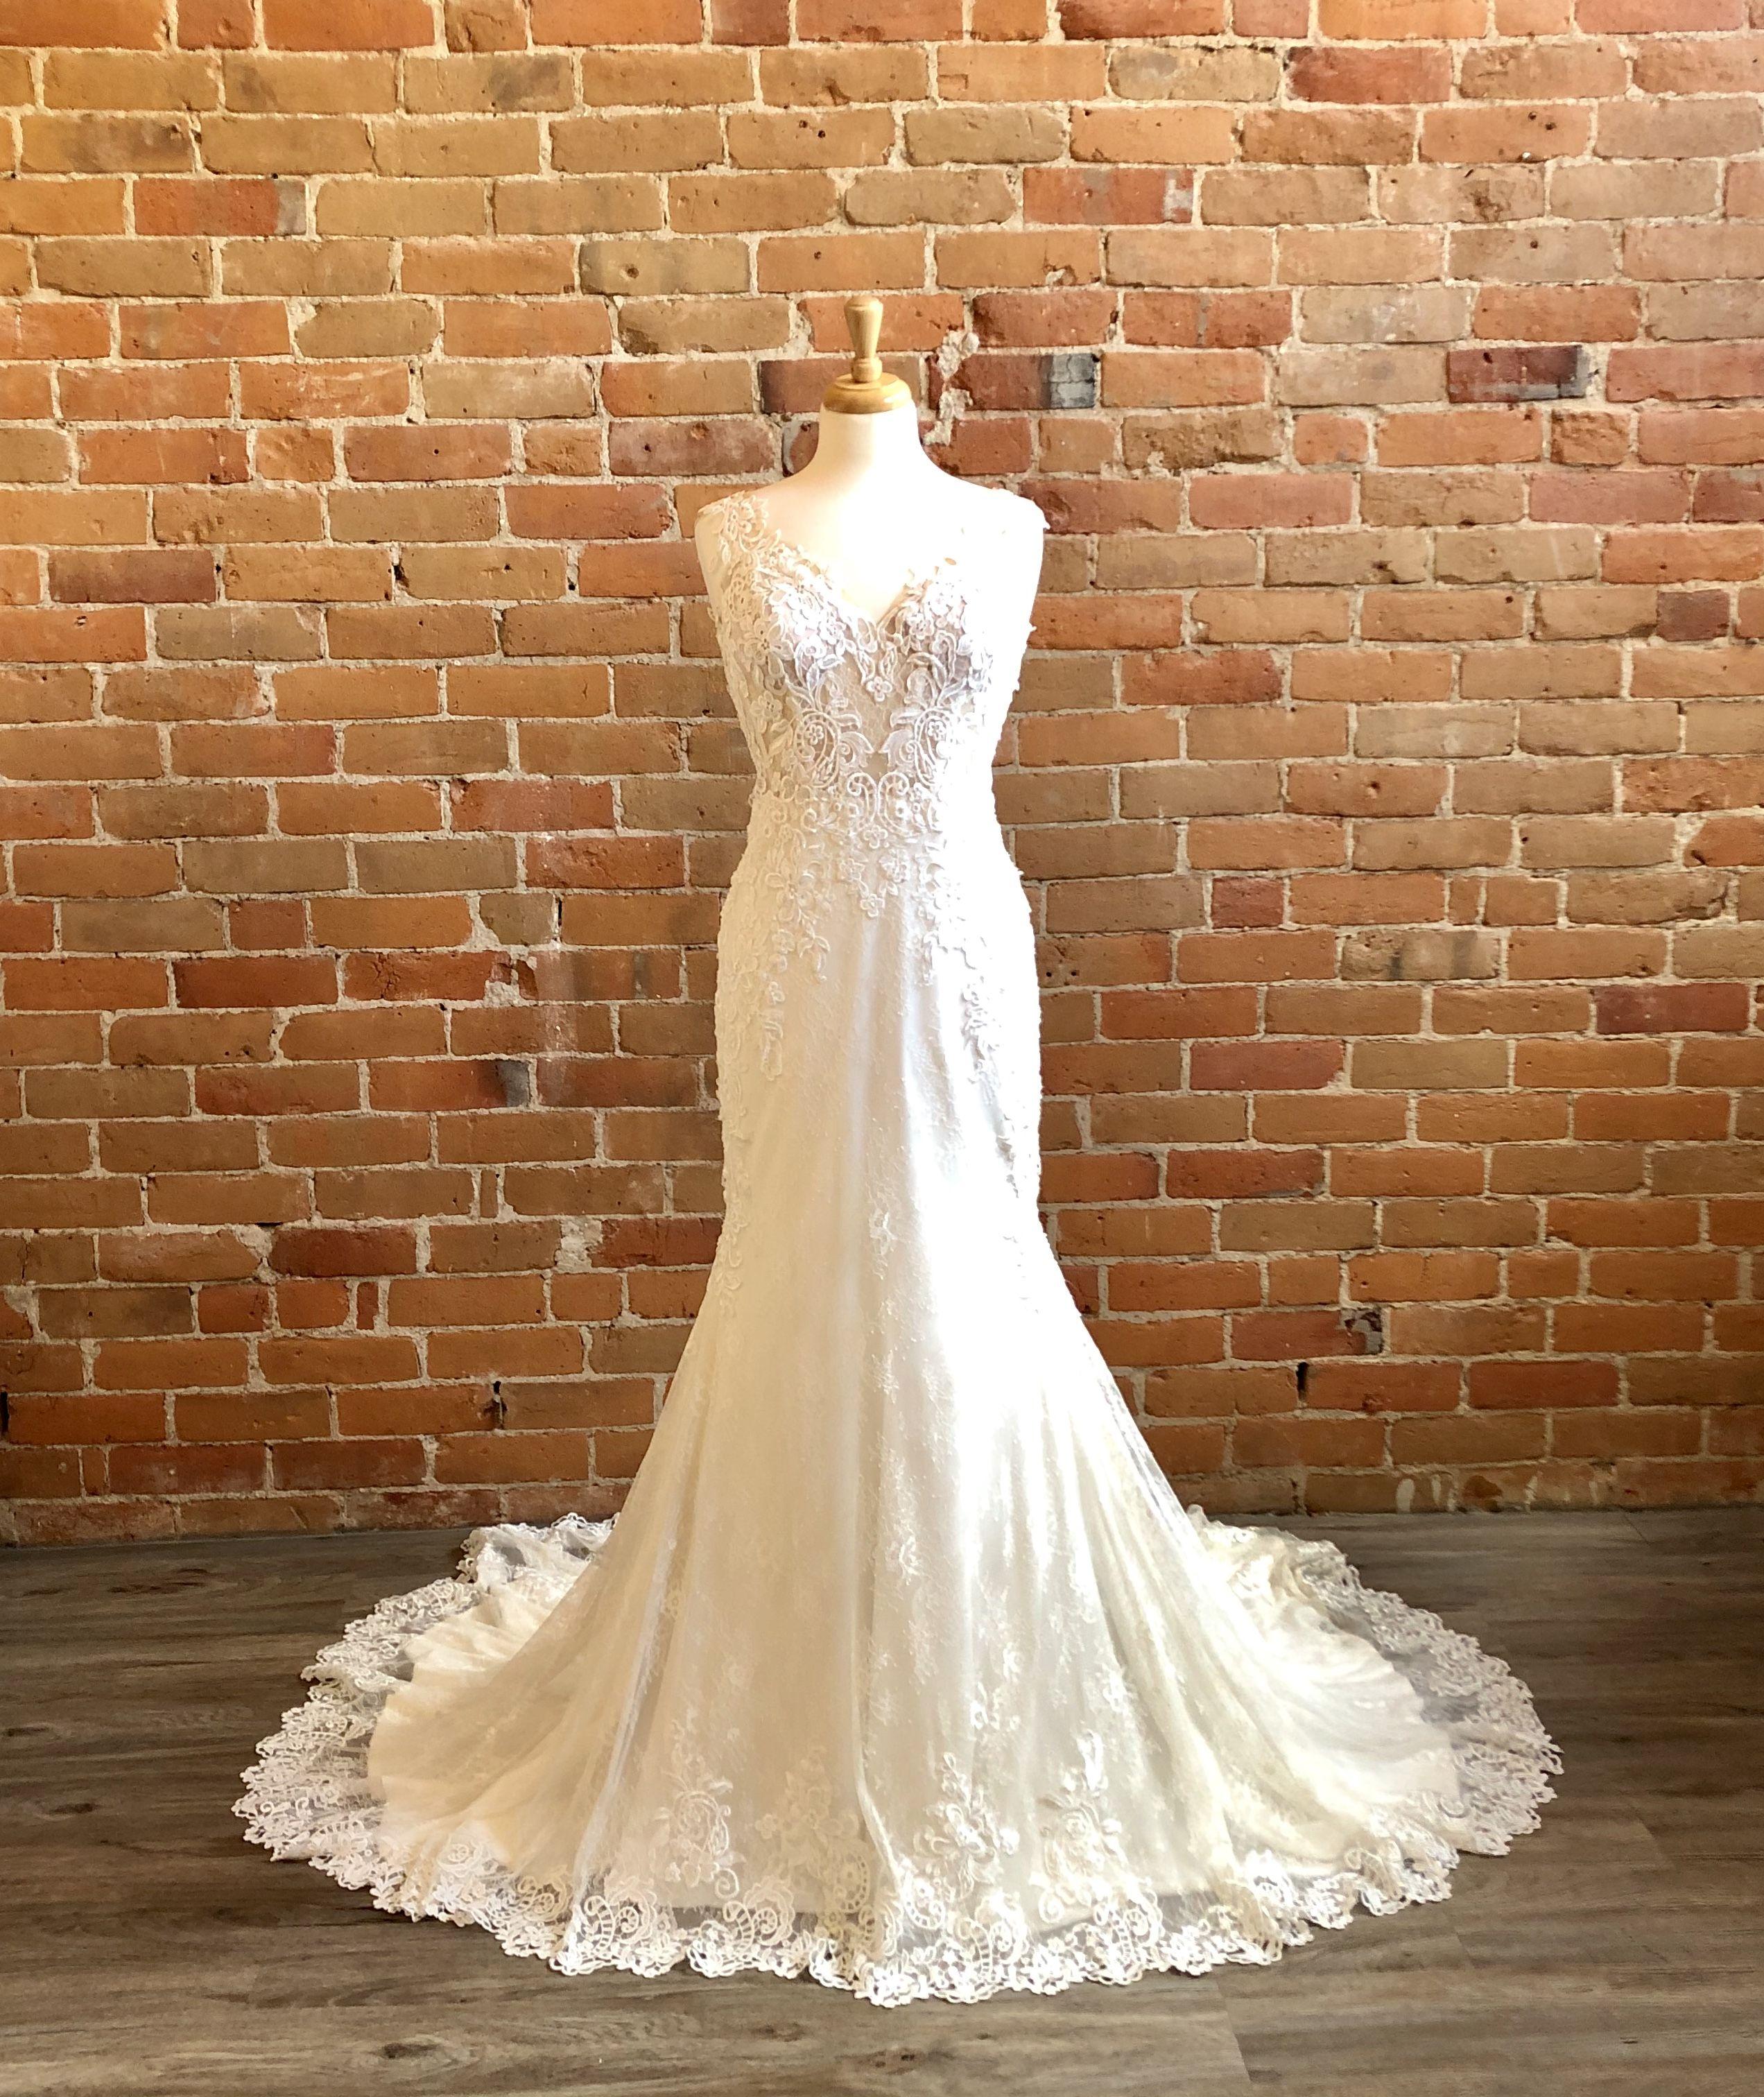 Lillian West 66012 In 2020 Boho Wedding Dress Maggie Sottero Wedding Dresses Designer Wedding Dresses